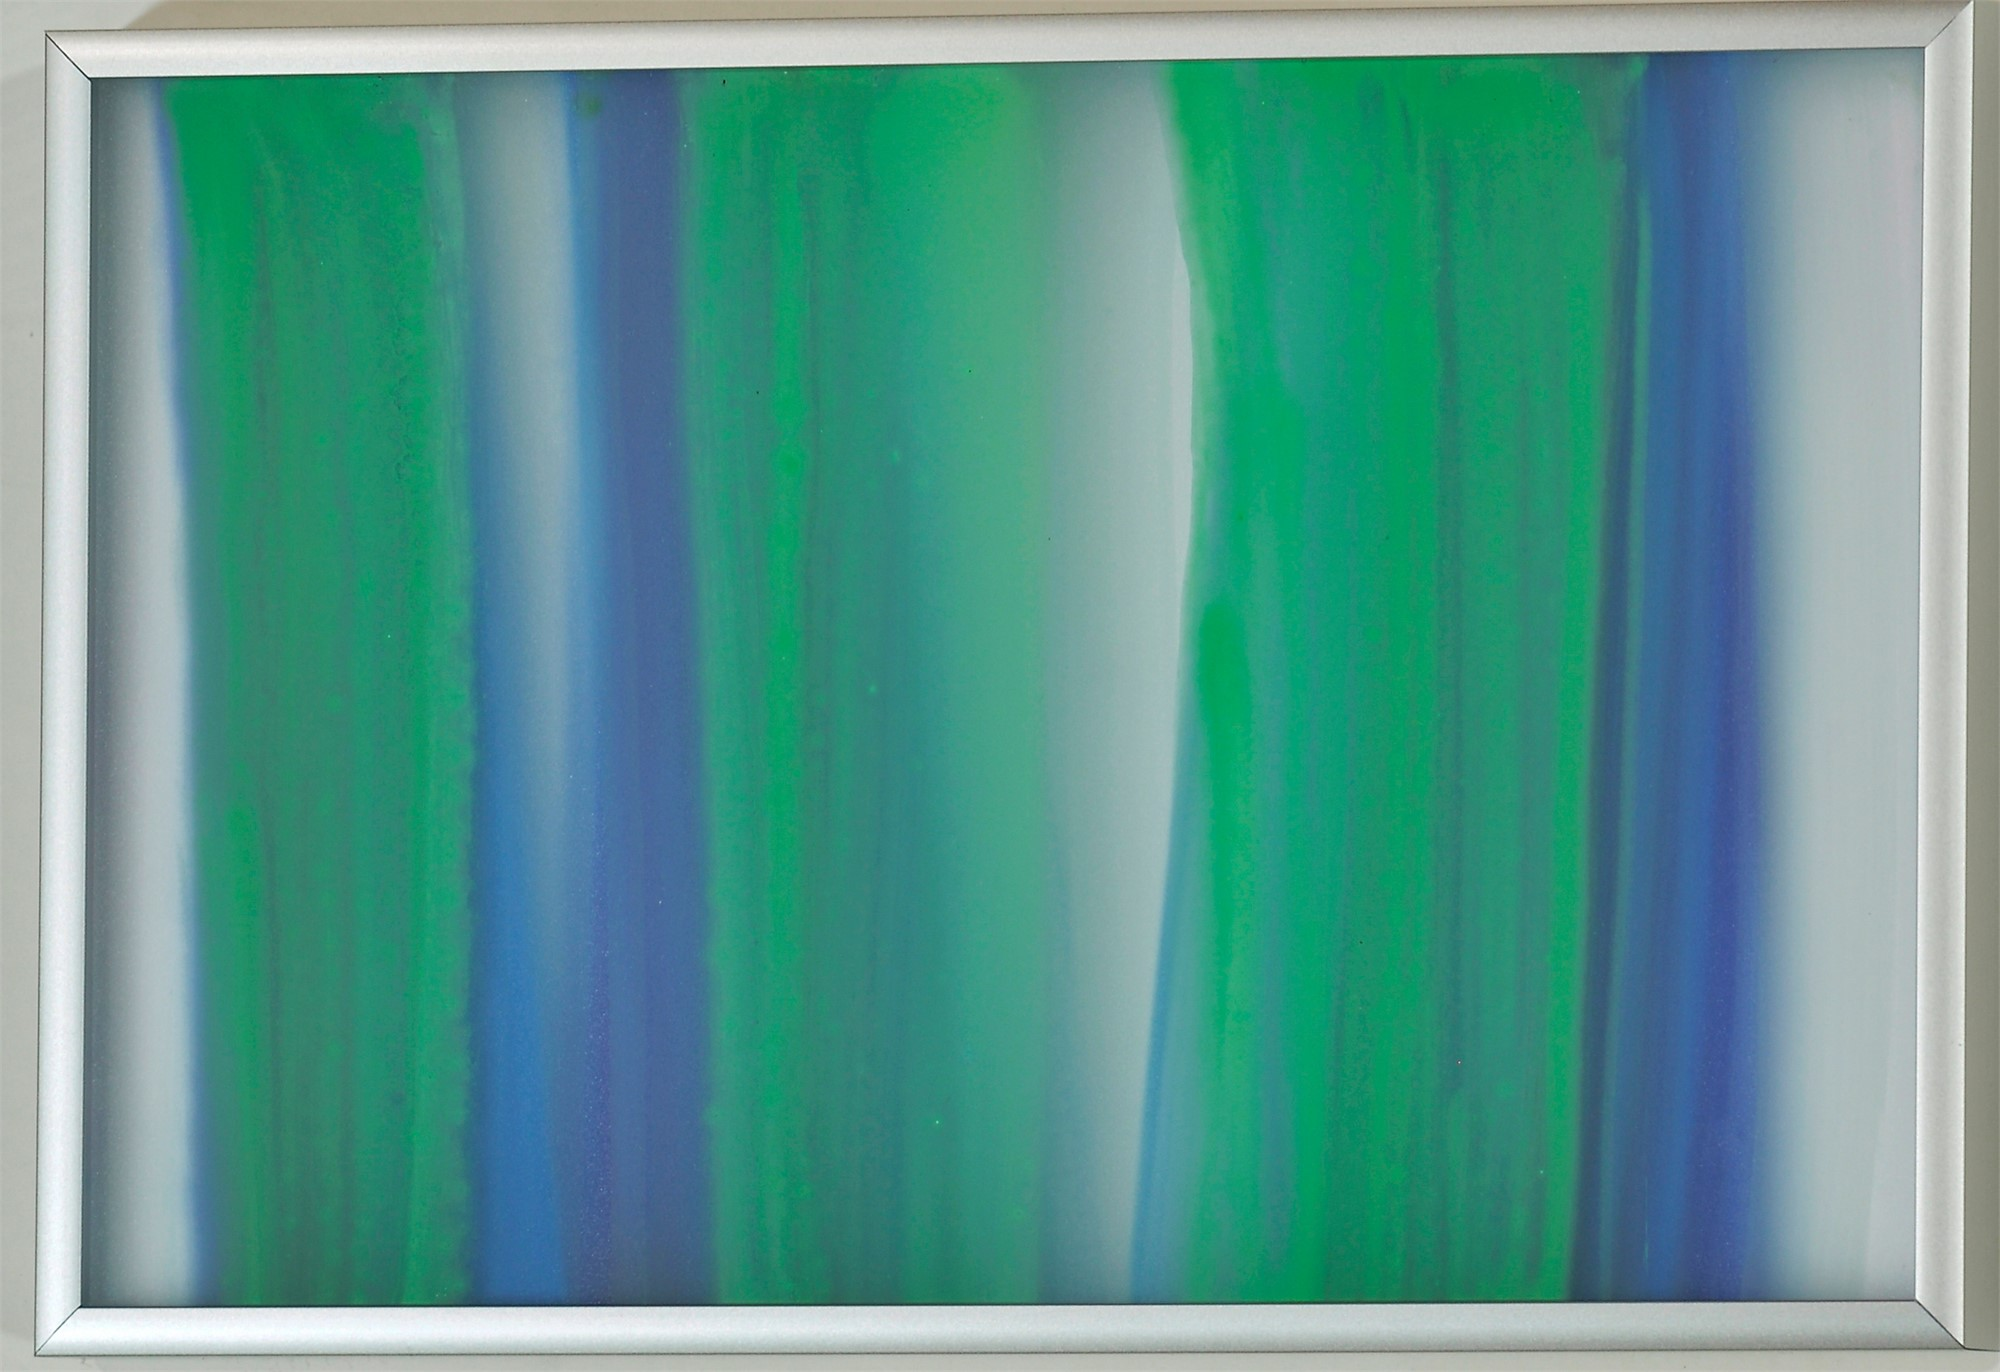 Sensing Lines 8 by Lucinda Cobley